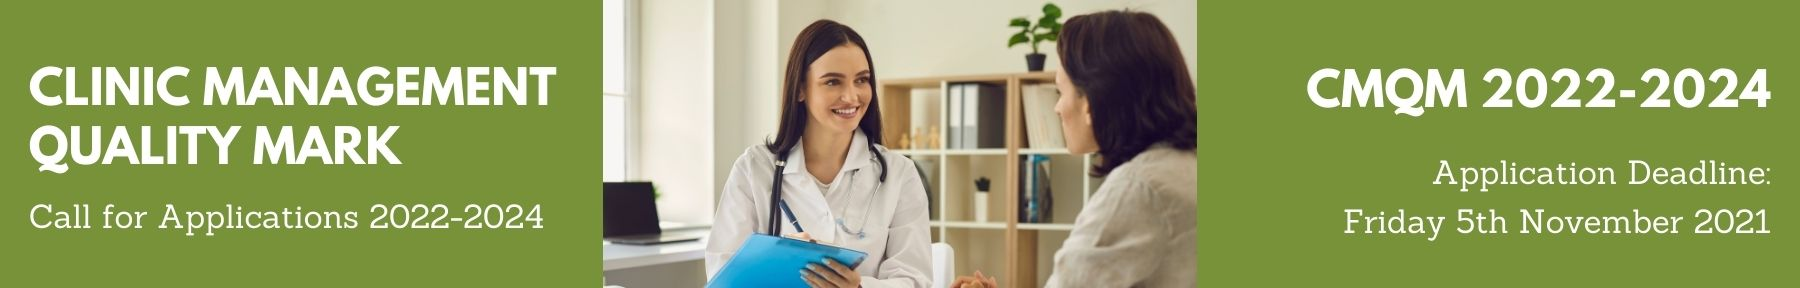 CMQM, clinical management, quality mark awards